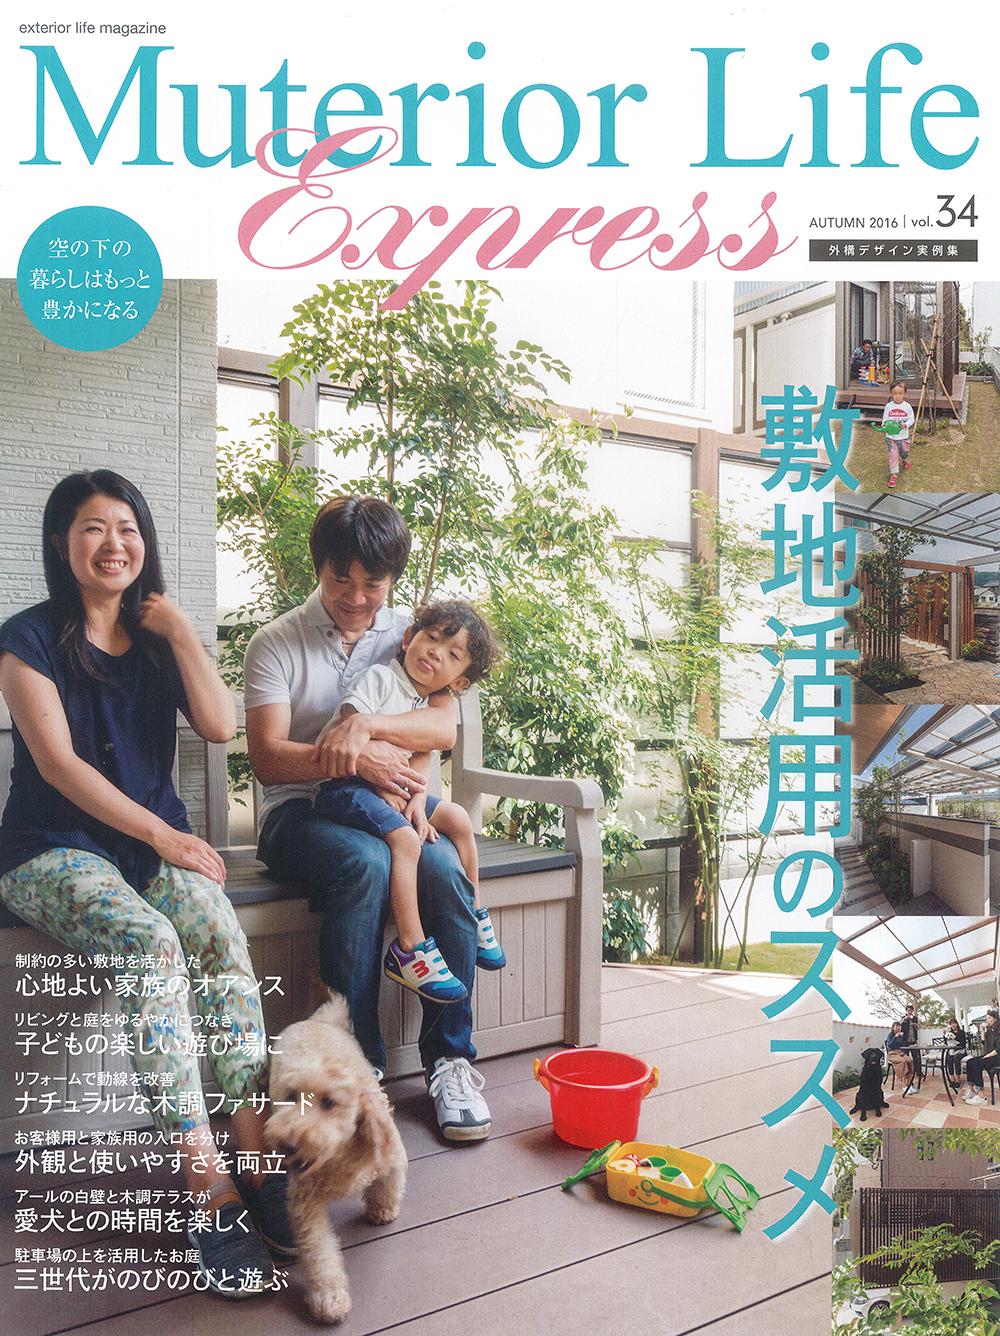 Muterior Life Express AUTUMN 2016 vol.34